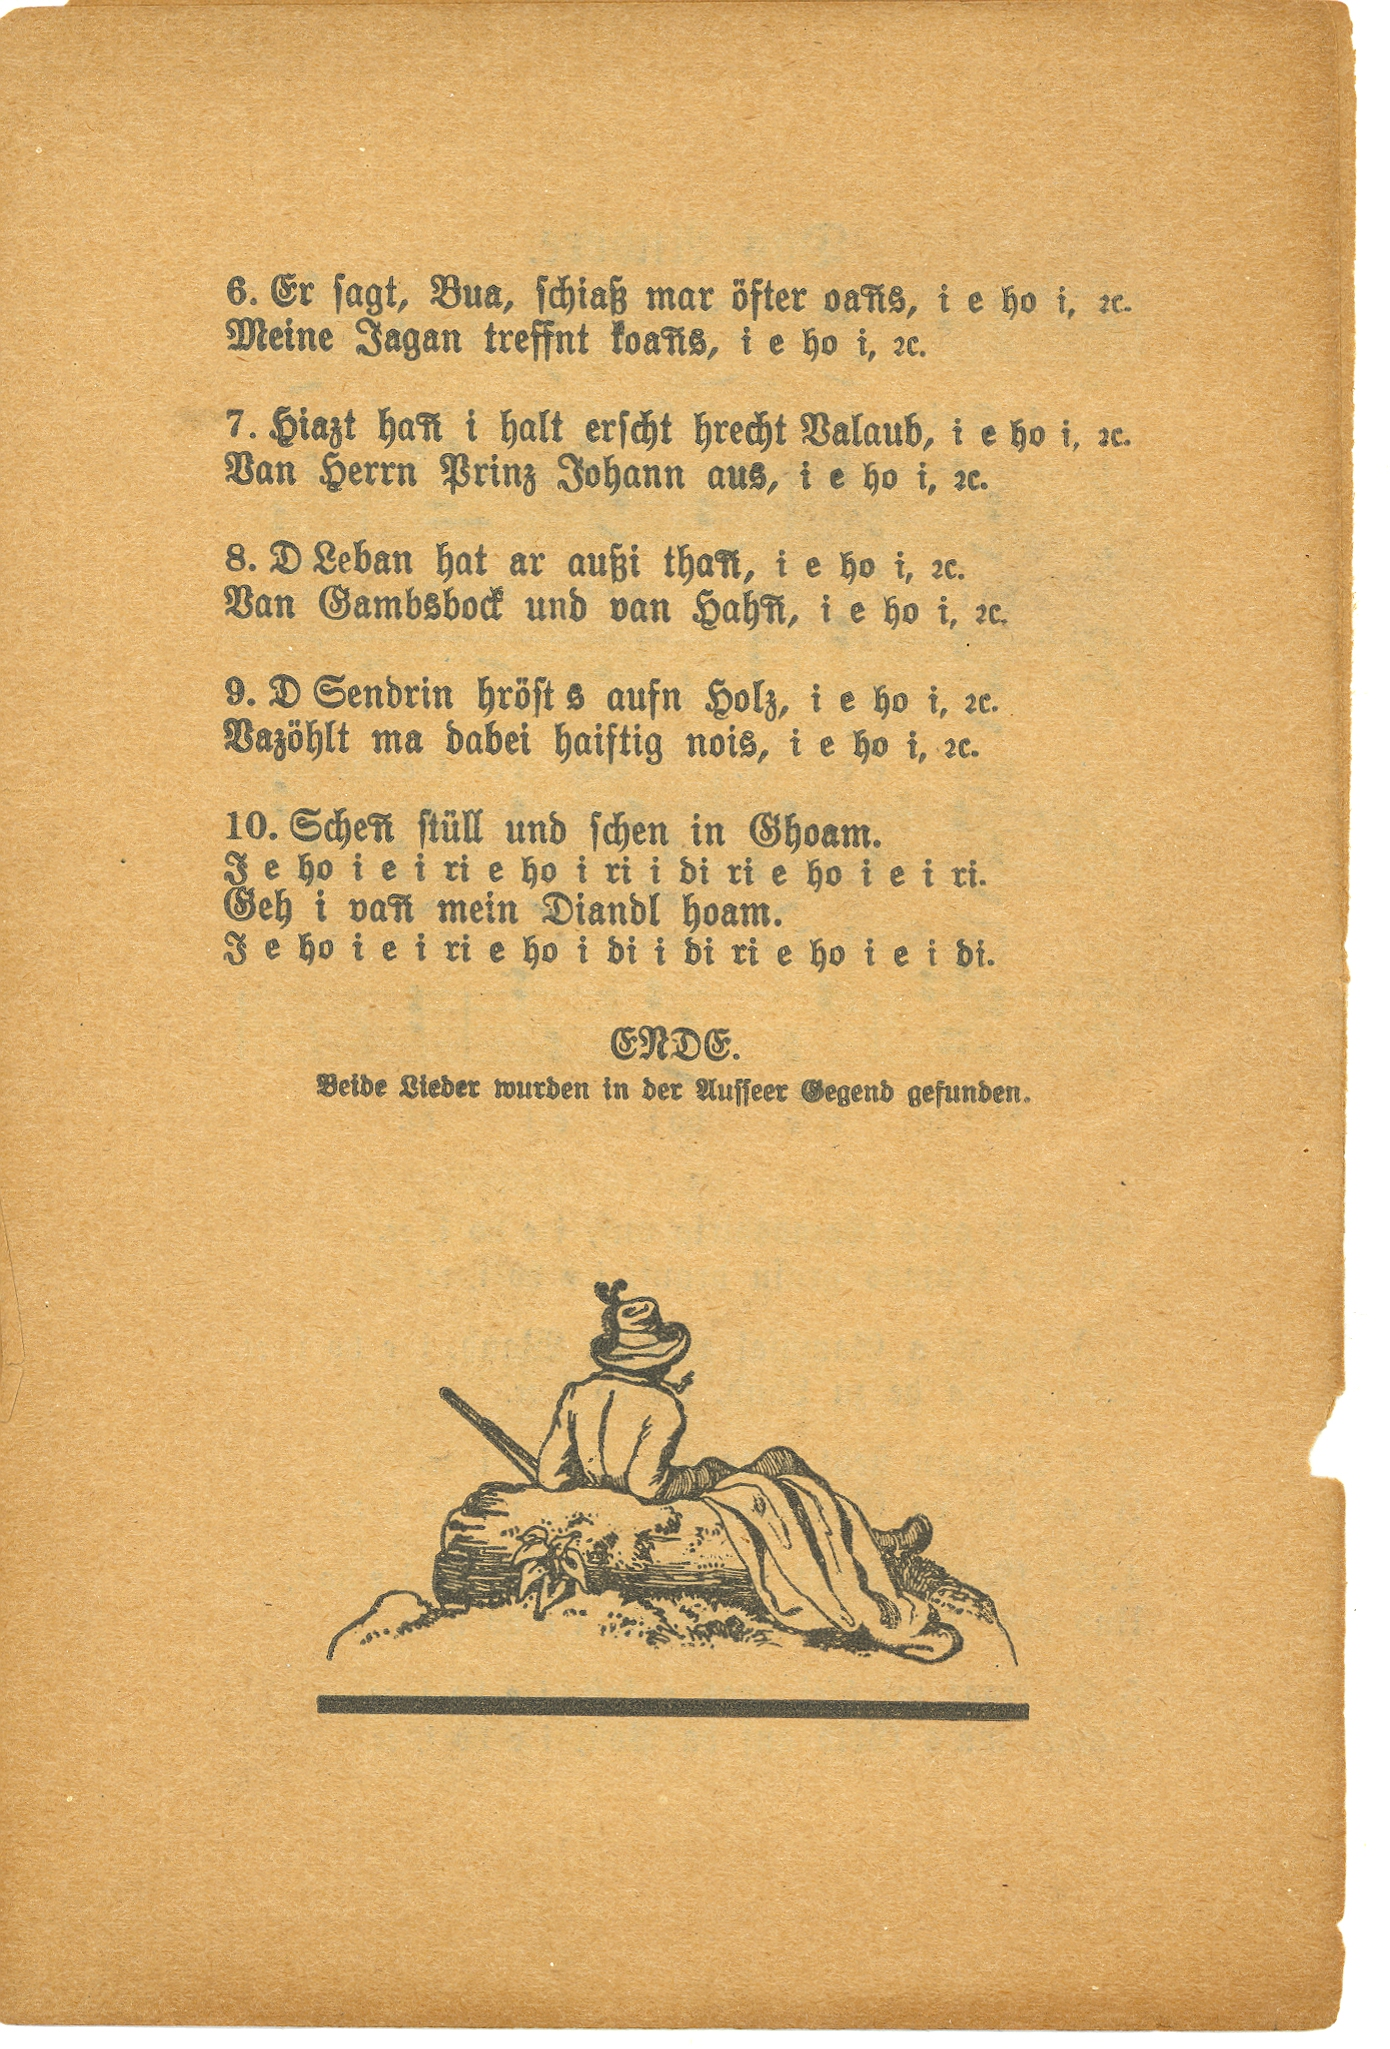 Alte Lieder fürs Landvolk. Nr. 1. Graz, undated. Songster Collection, ca. 1780-1910 (TCS 89). Harvard Theatre Collection, Houghton Library, Harvard University. Box 56, folder 968.